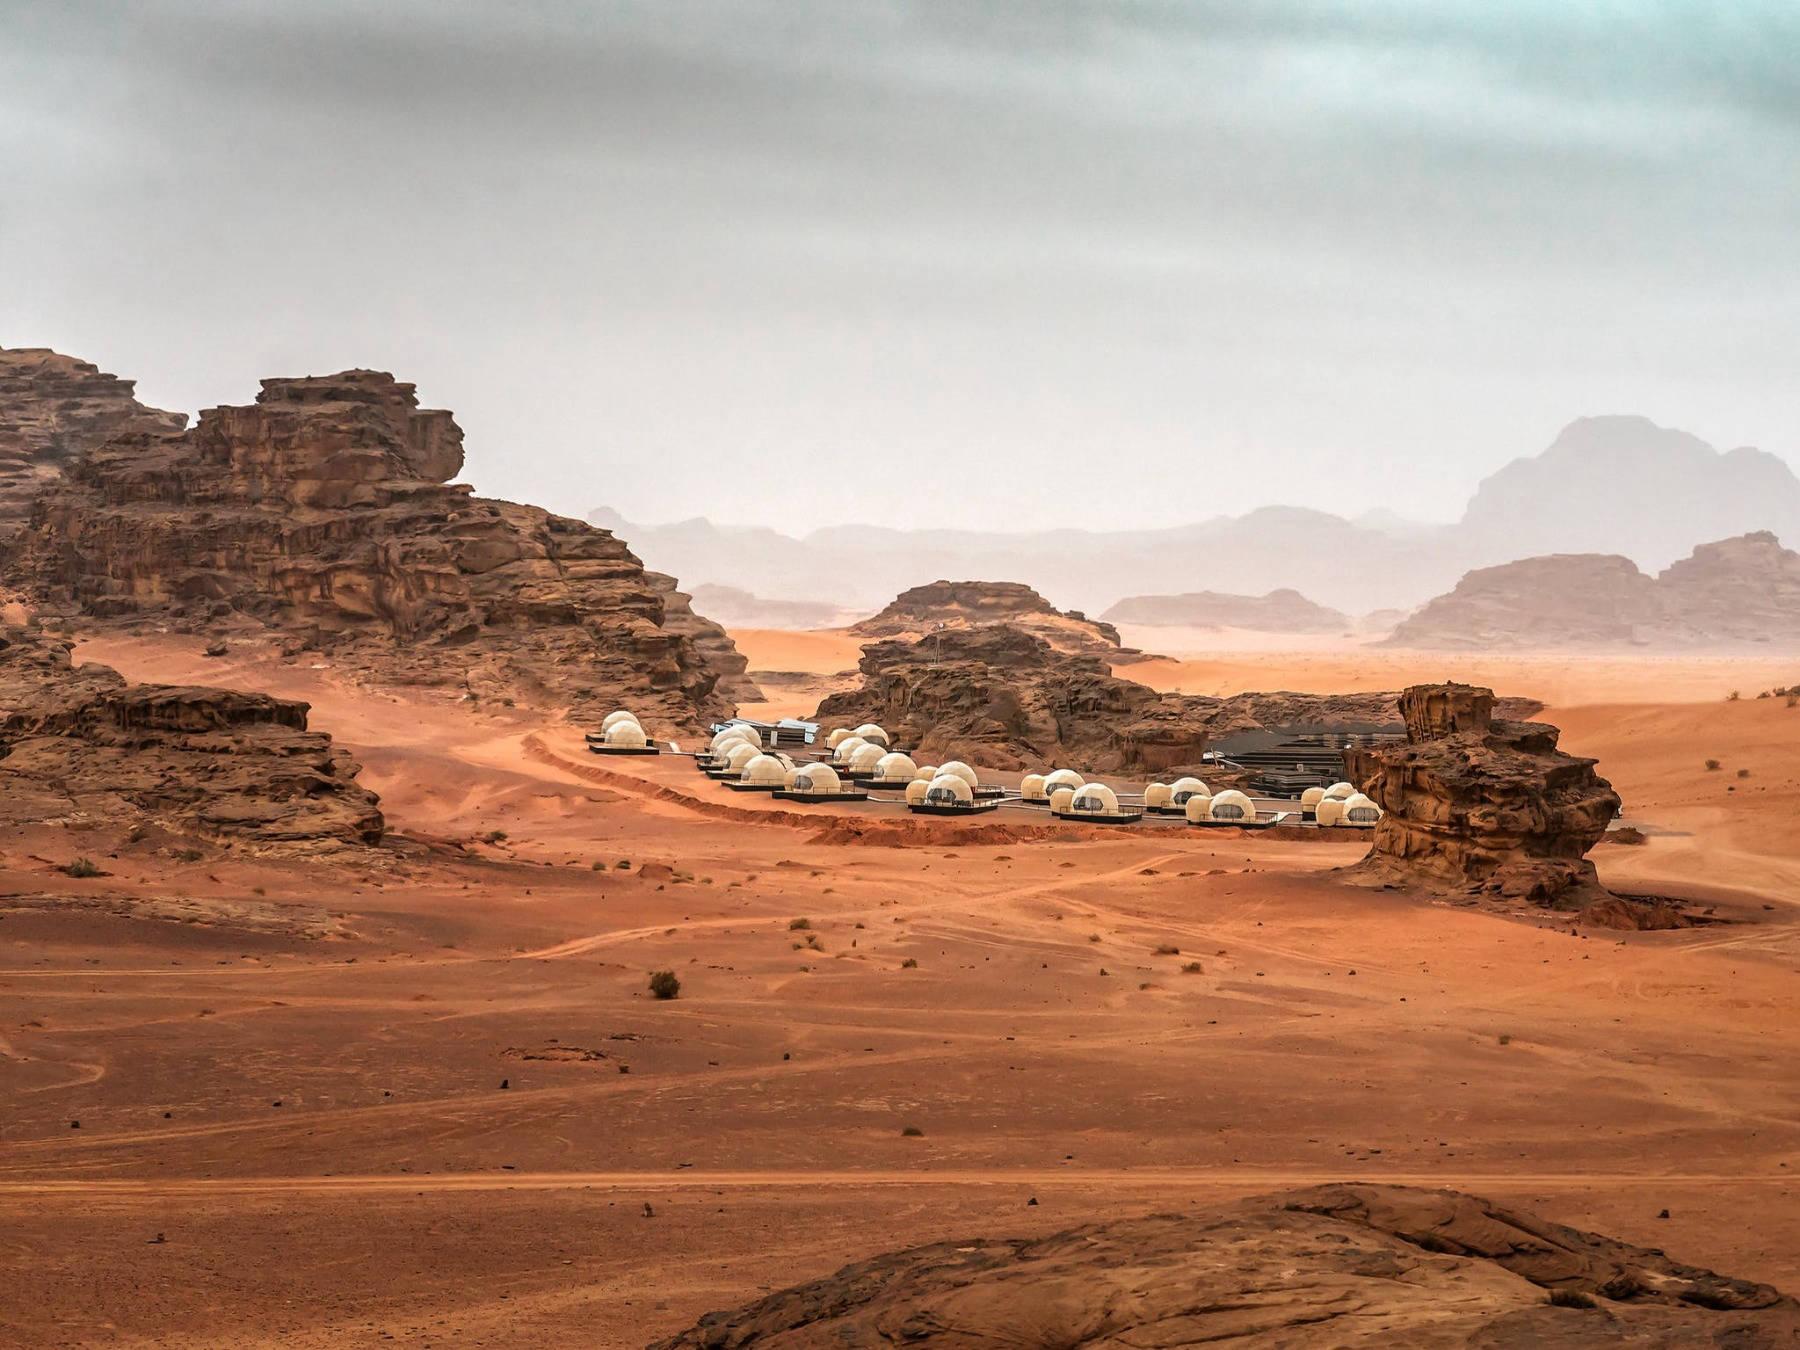 martian domes in jordan desert